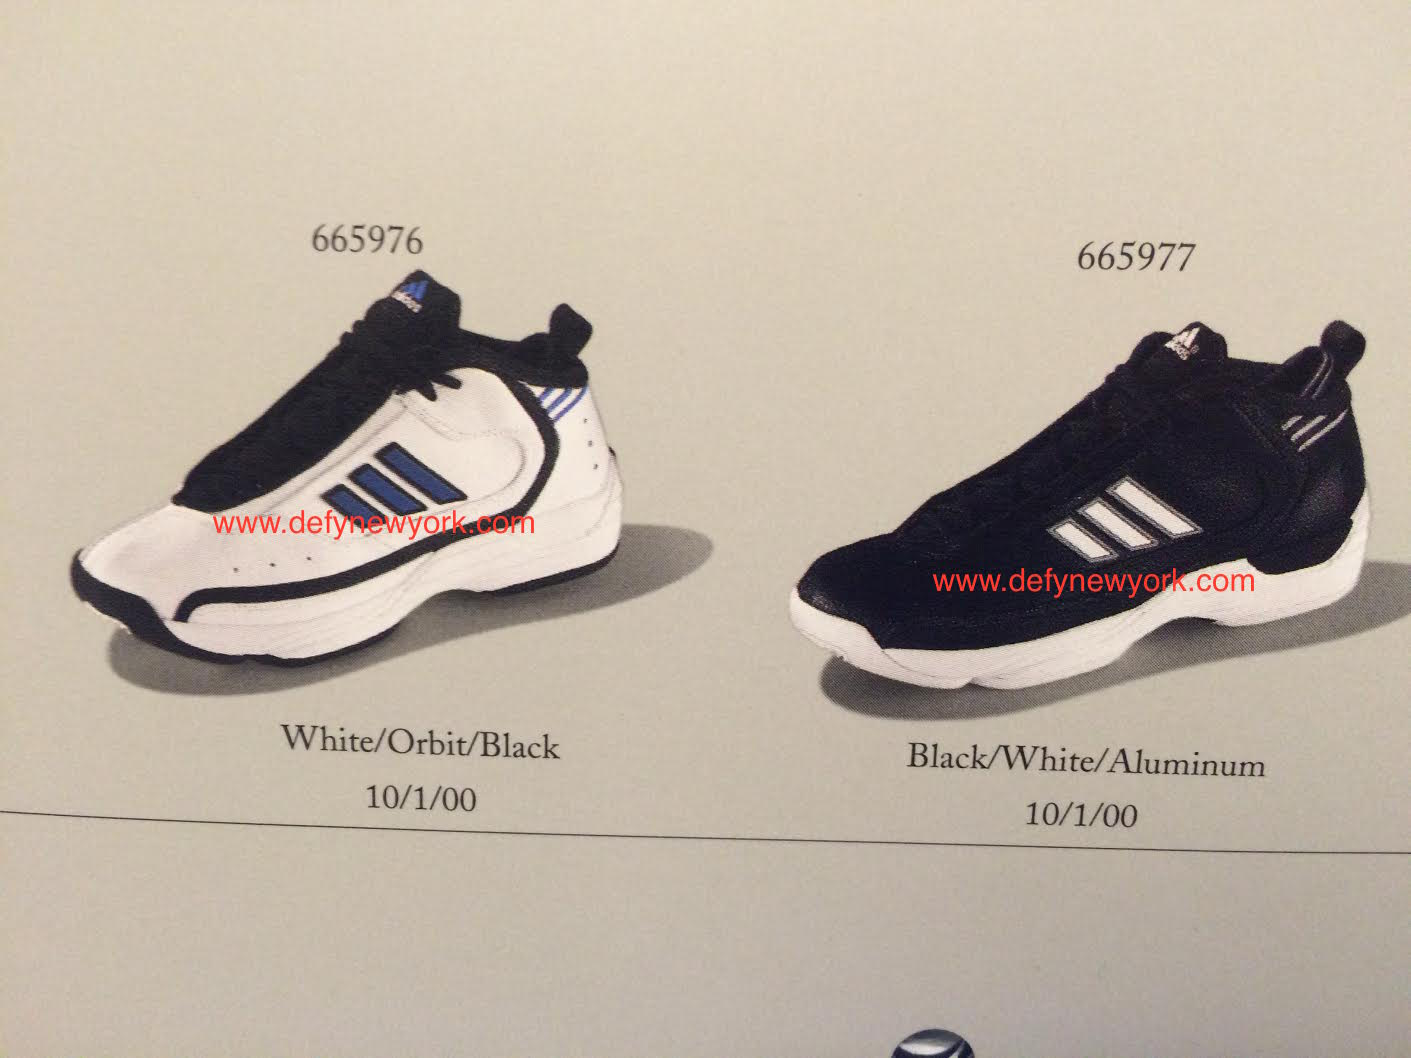 Adidas Durus Mid Basketball Shoe 2000